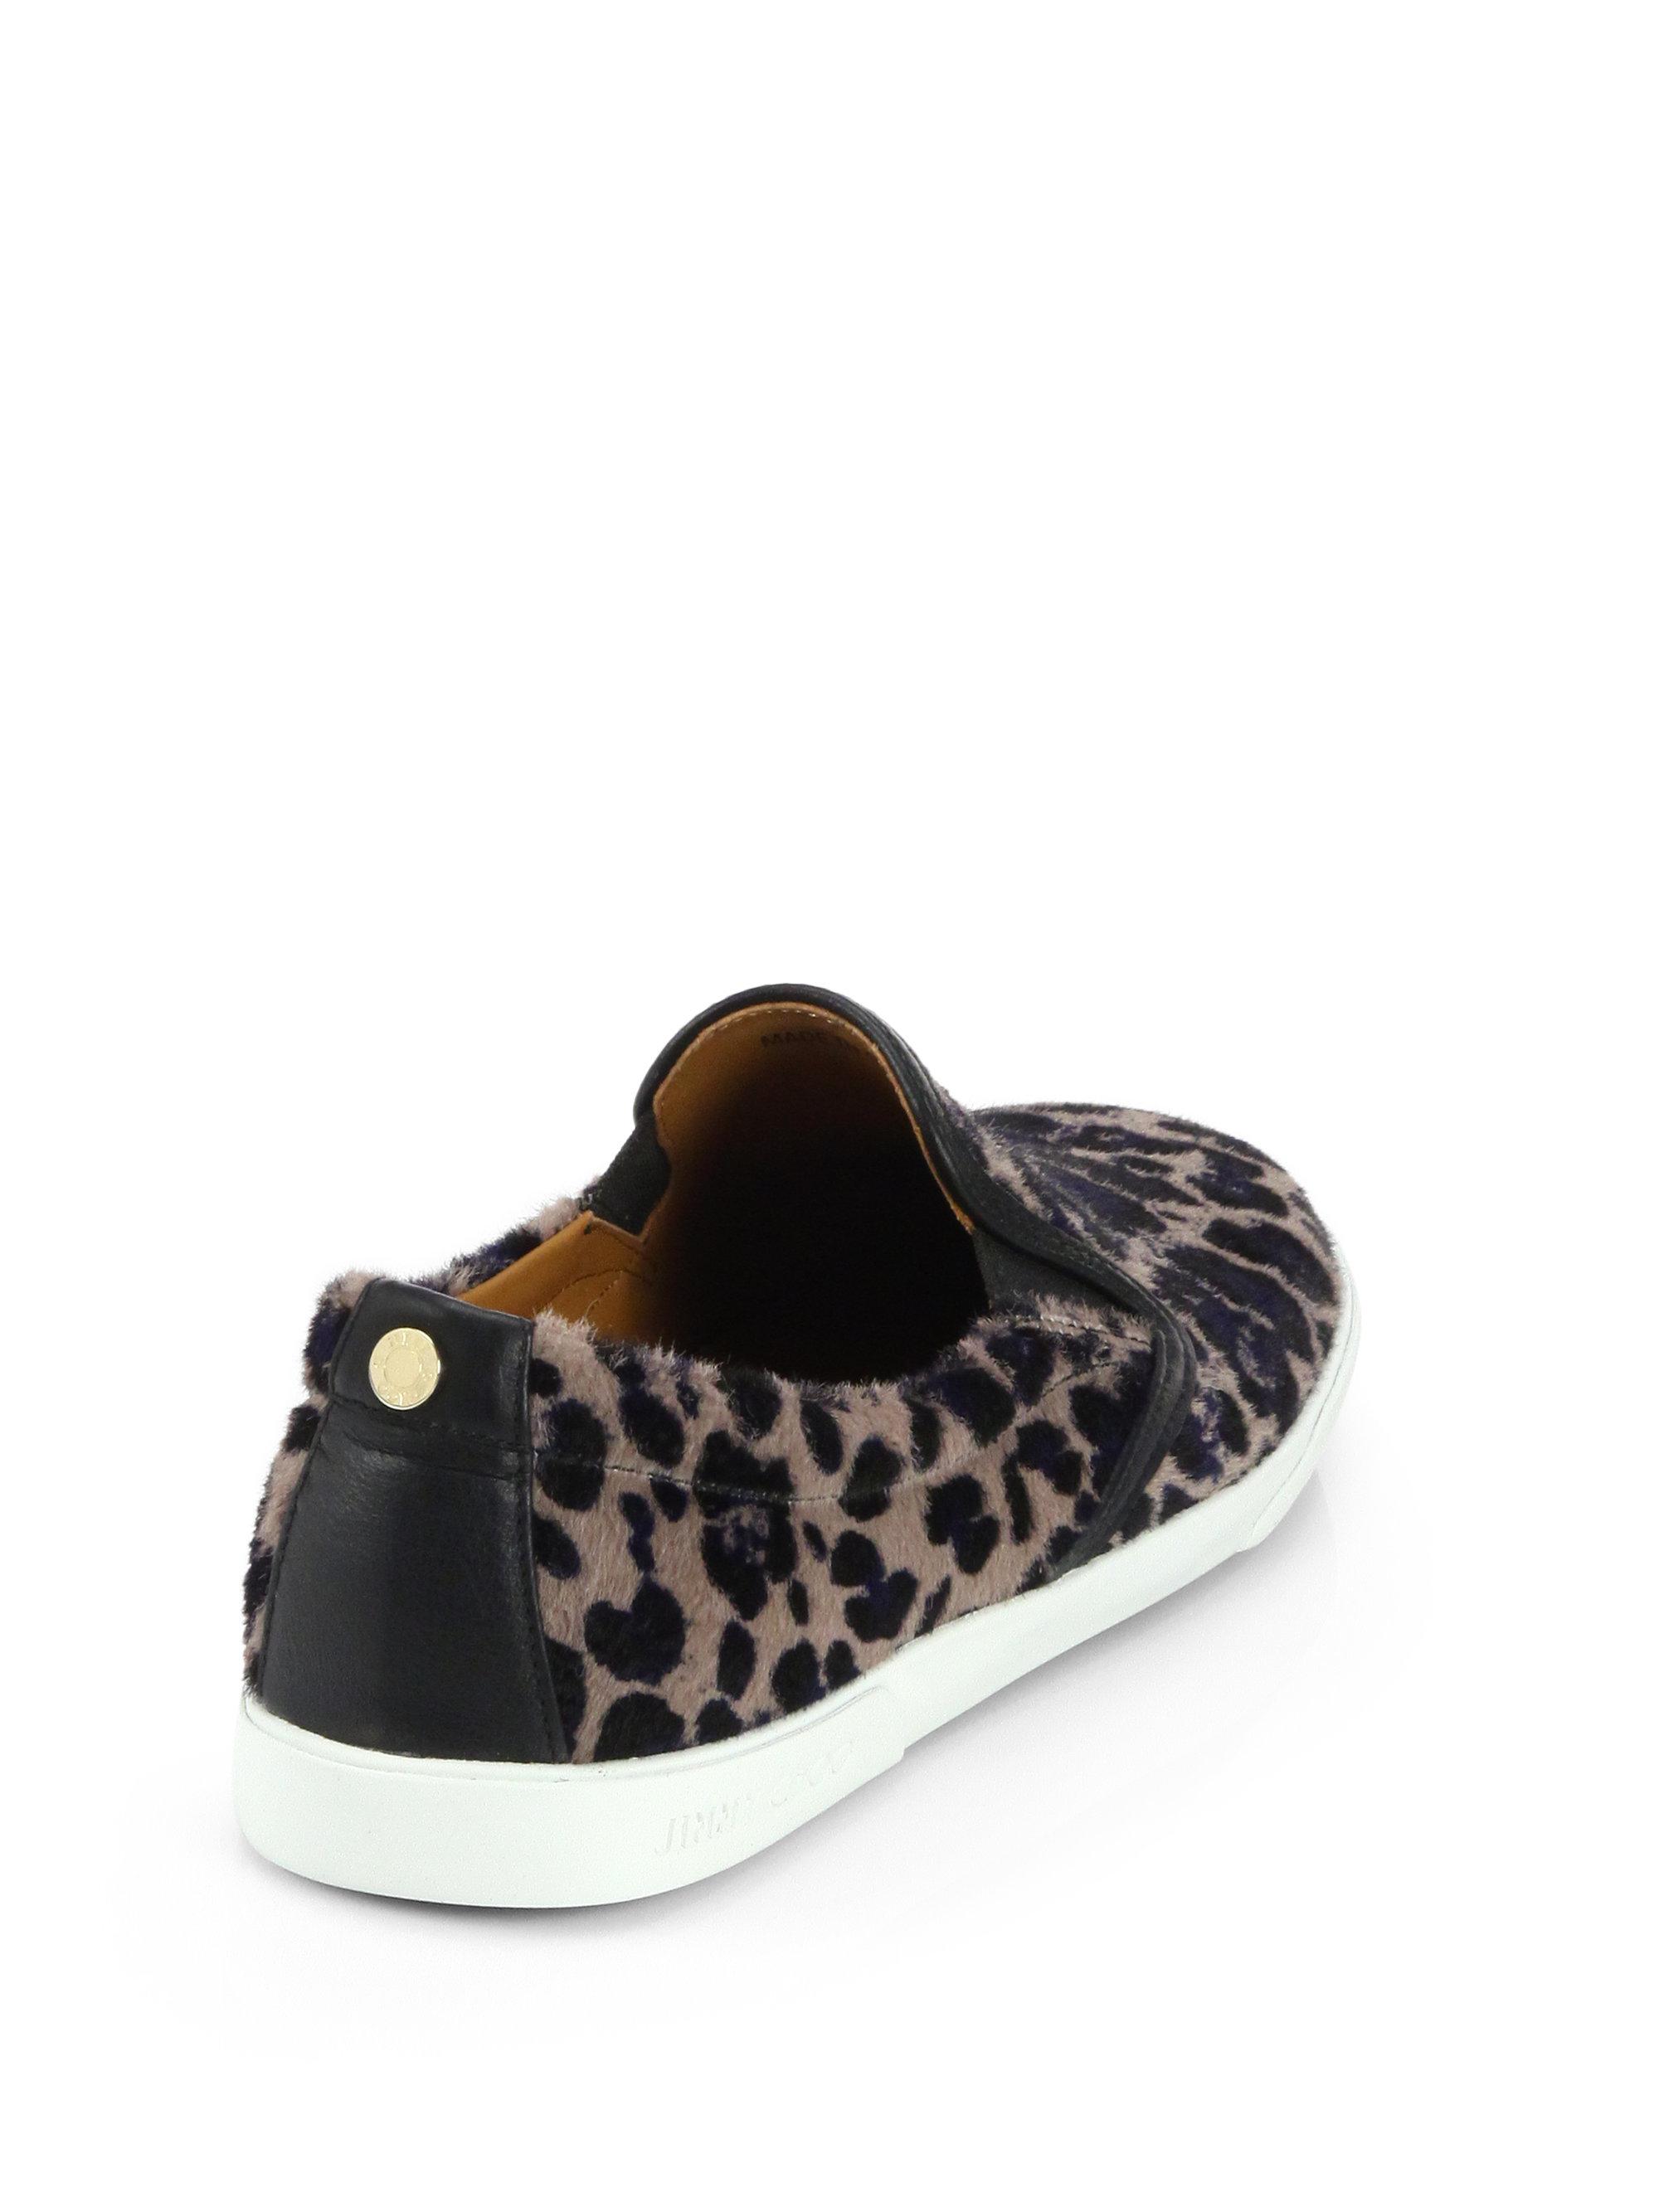 fab24ccad95 Lyst - Jimmy Choo Demi Leopard-Print Calf Hair Sneakers